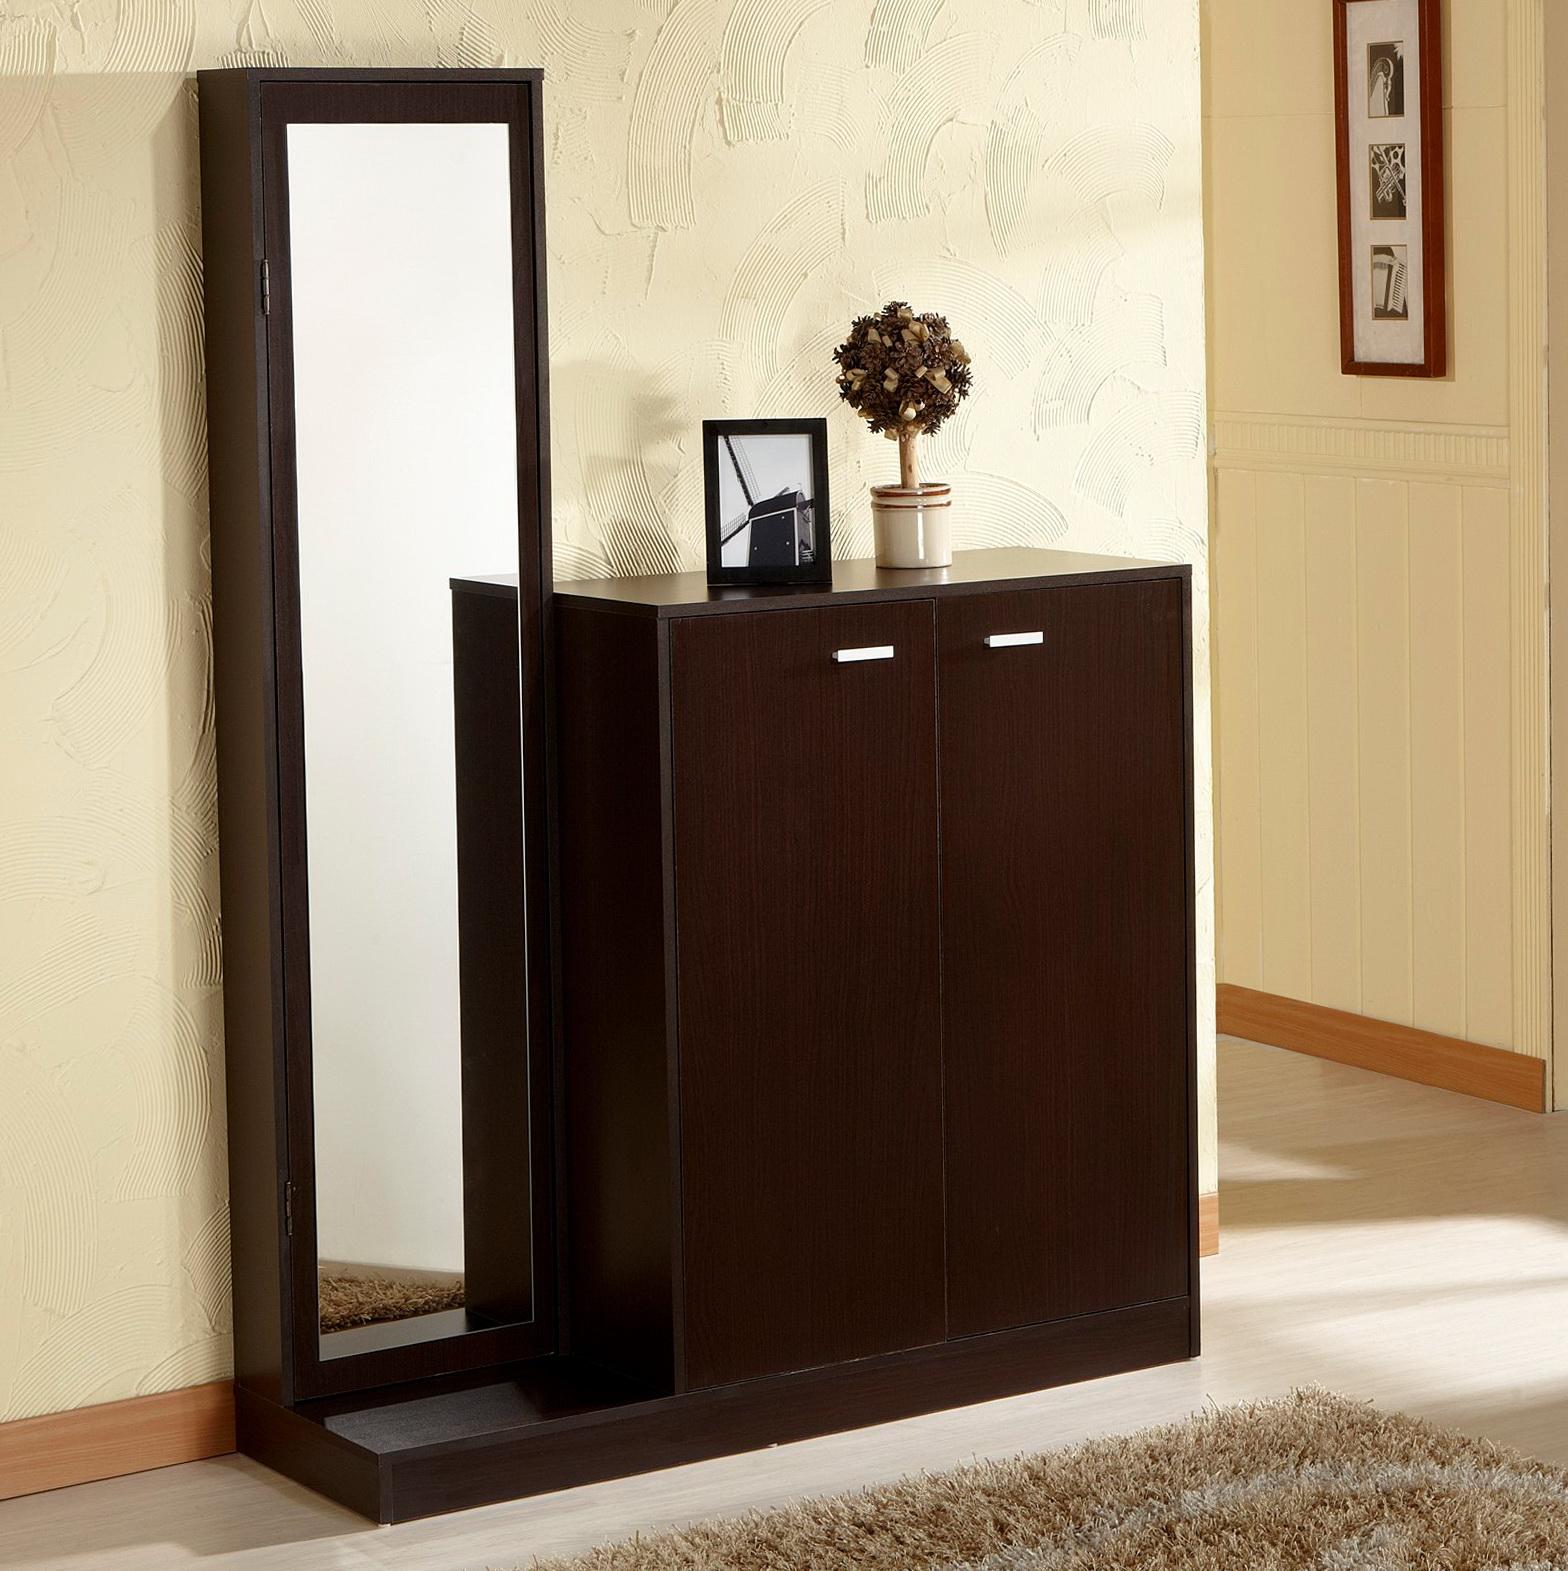 floor length mirror in living room home design ideas. Black Bedroom Furniture Sets. Home Design Ideas